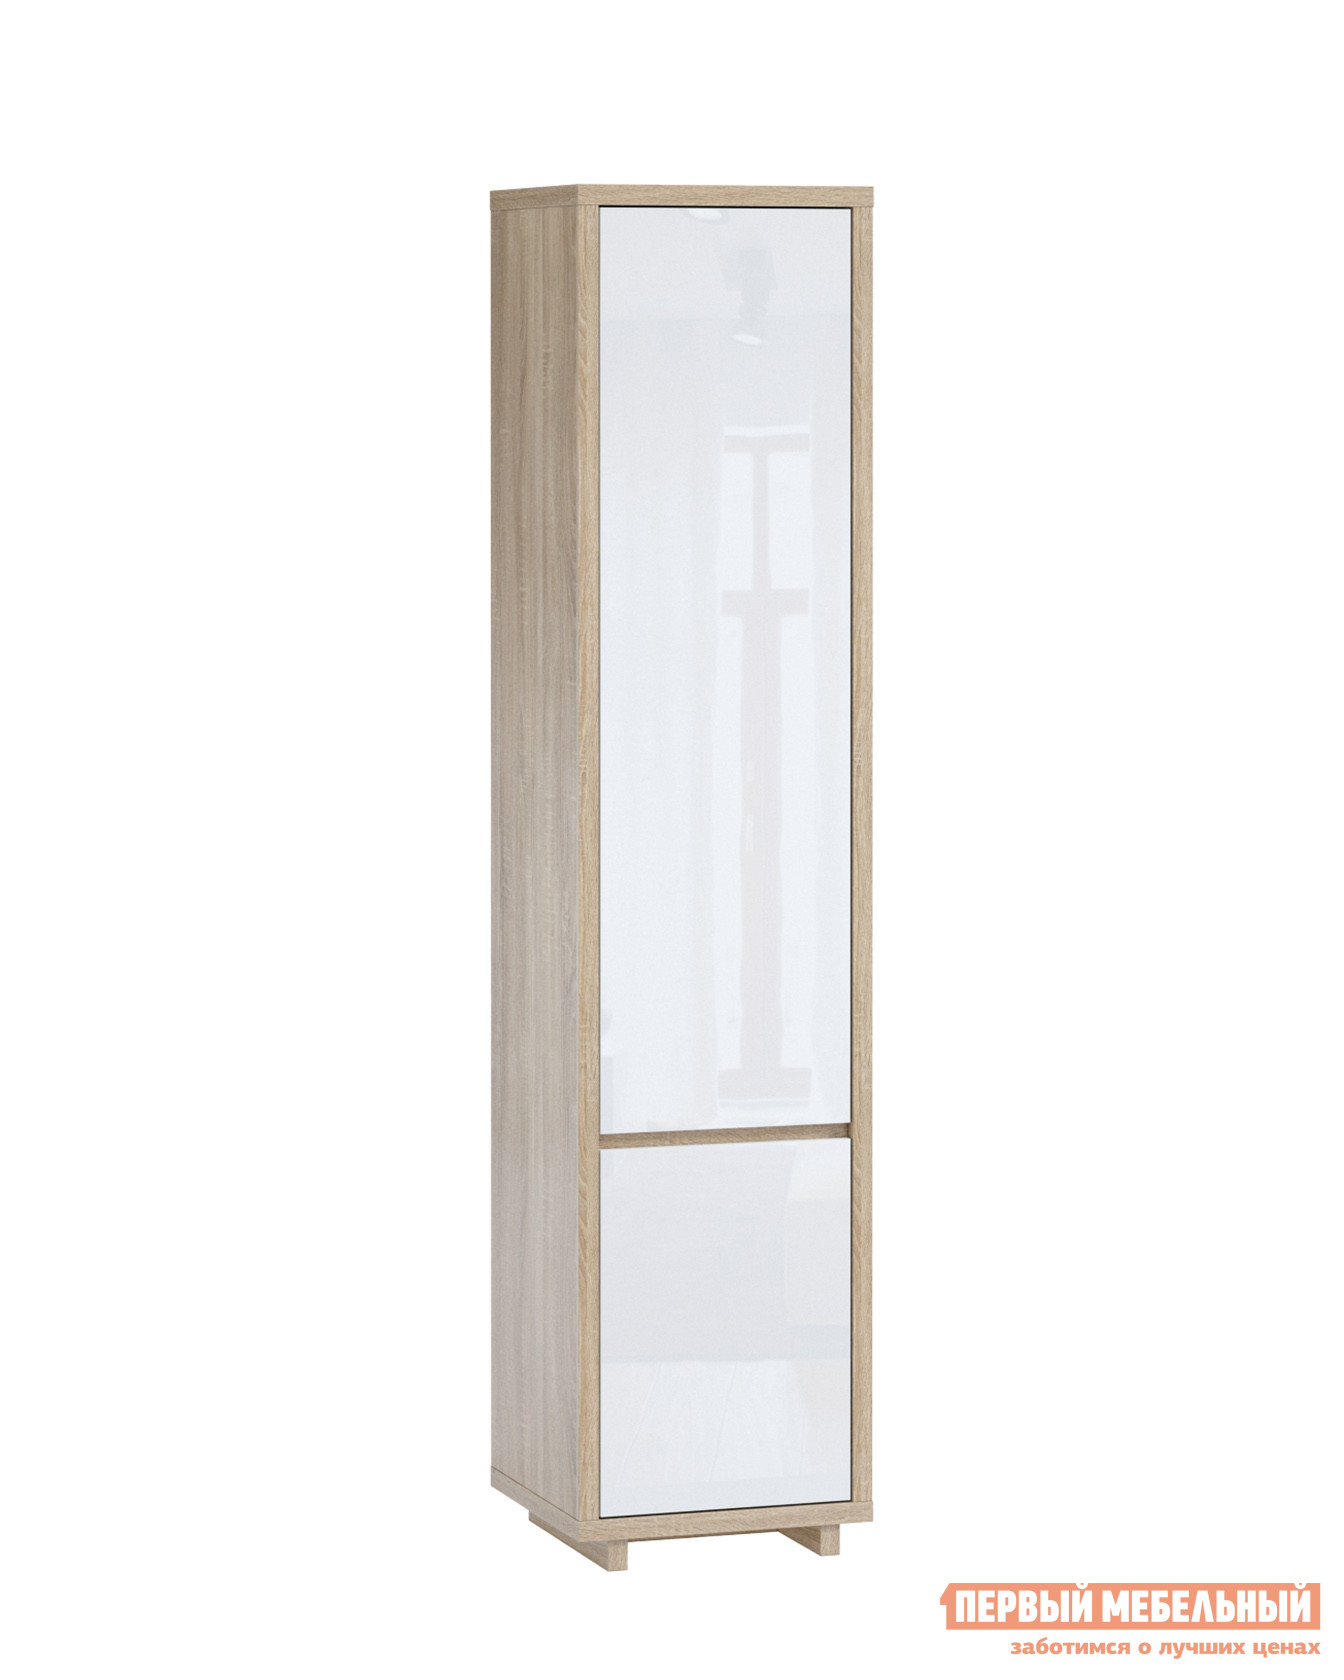 Шкаф WOODCRAFT Аспен Шкаф-пенал (2 двери) Дуб Сонома / Белый глянец от Купистол